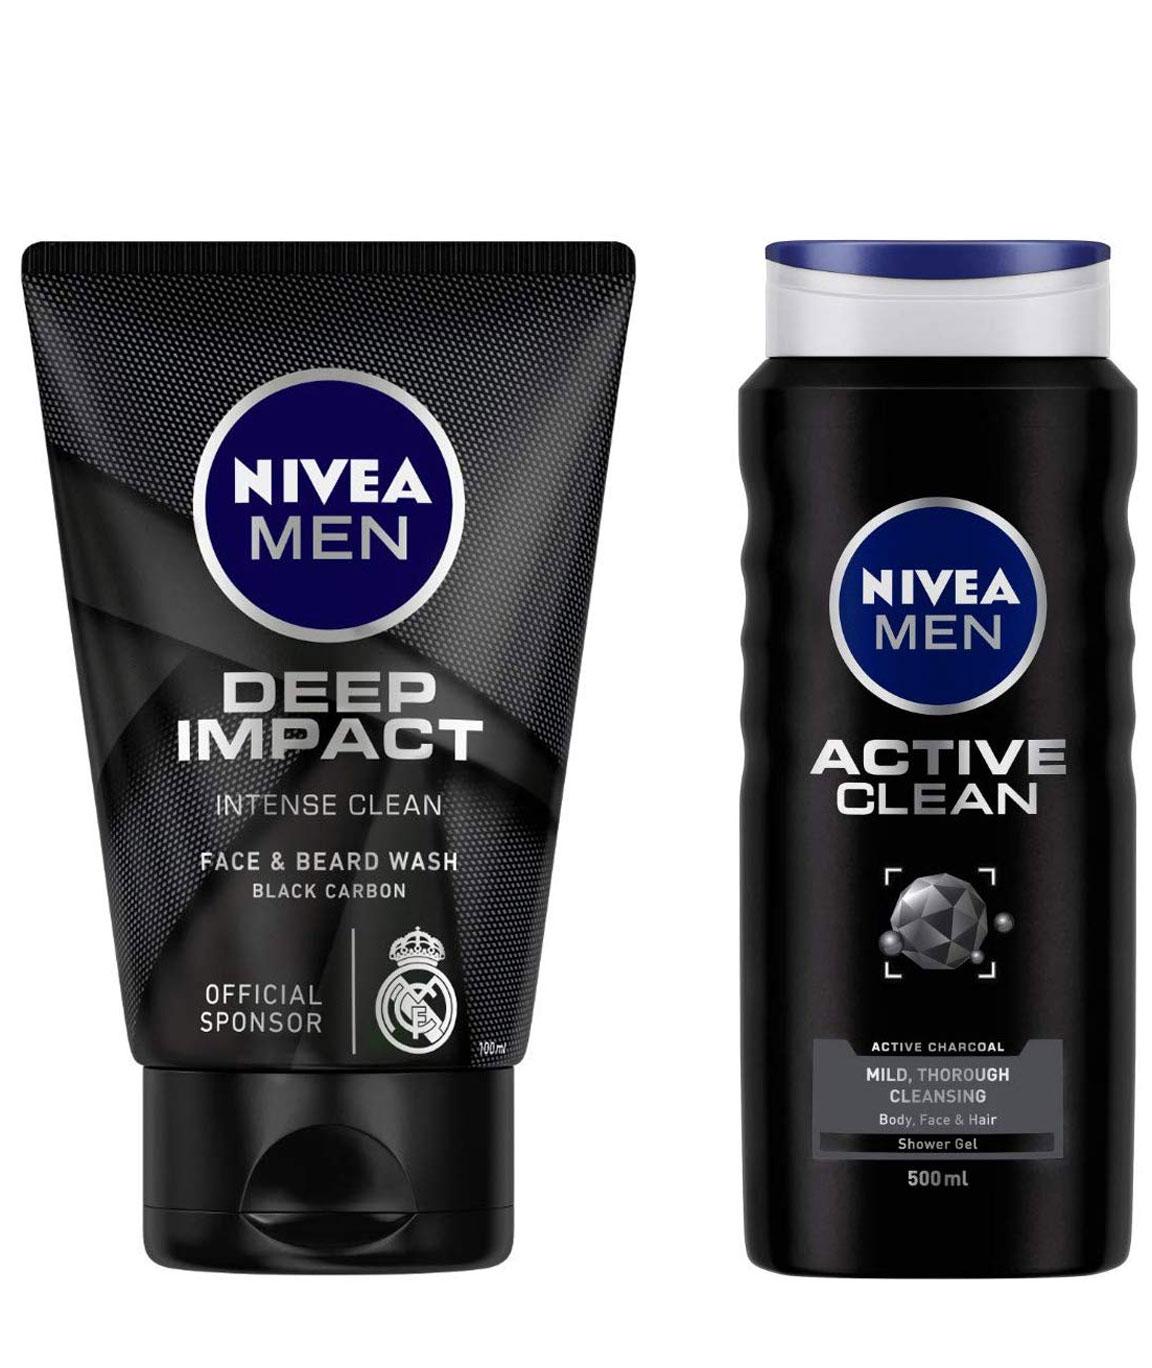 NIVEA MEN Face & Beard Wash, Deep Impact Intense Clean, 100ml & MEN Hair, Face & Body Wash, Active Clean Shower Gel, 500ml Combo